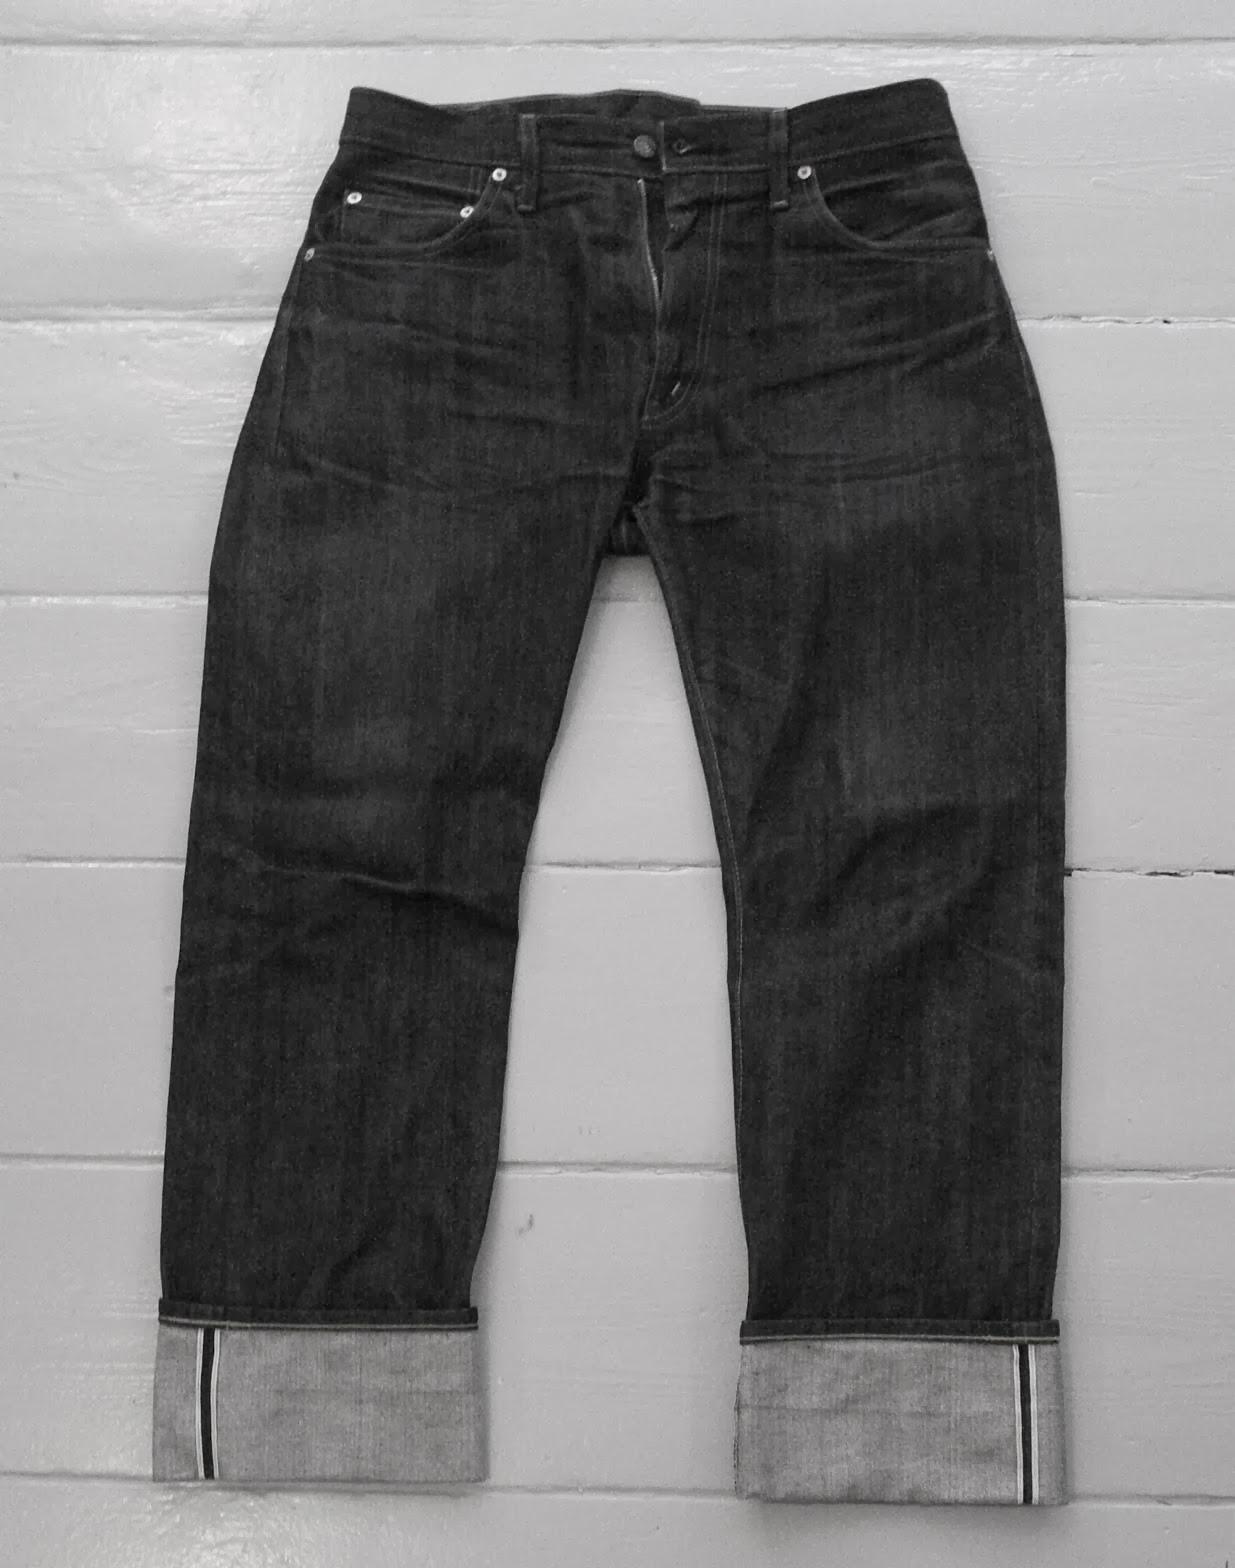 LVC 505 Jeans